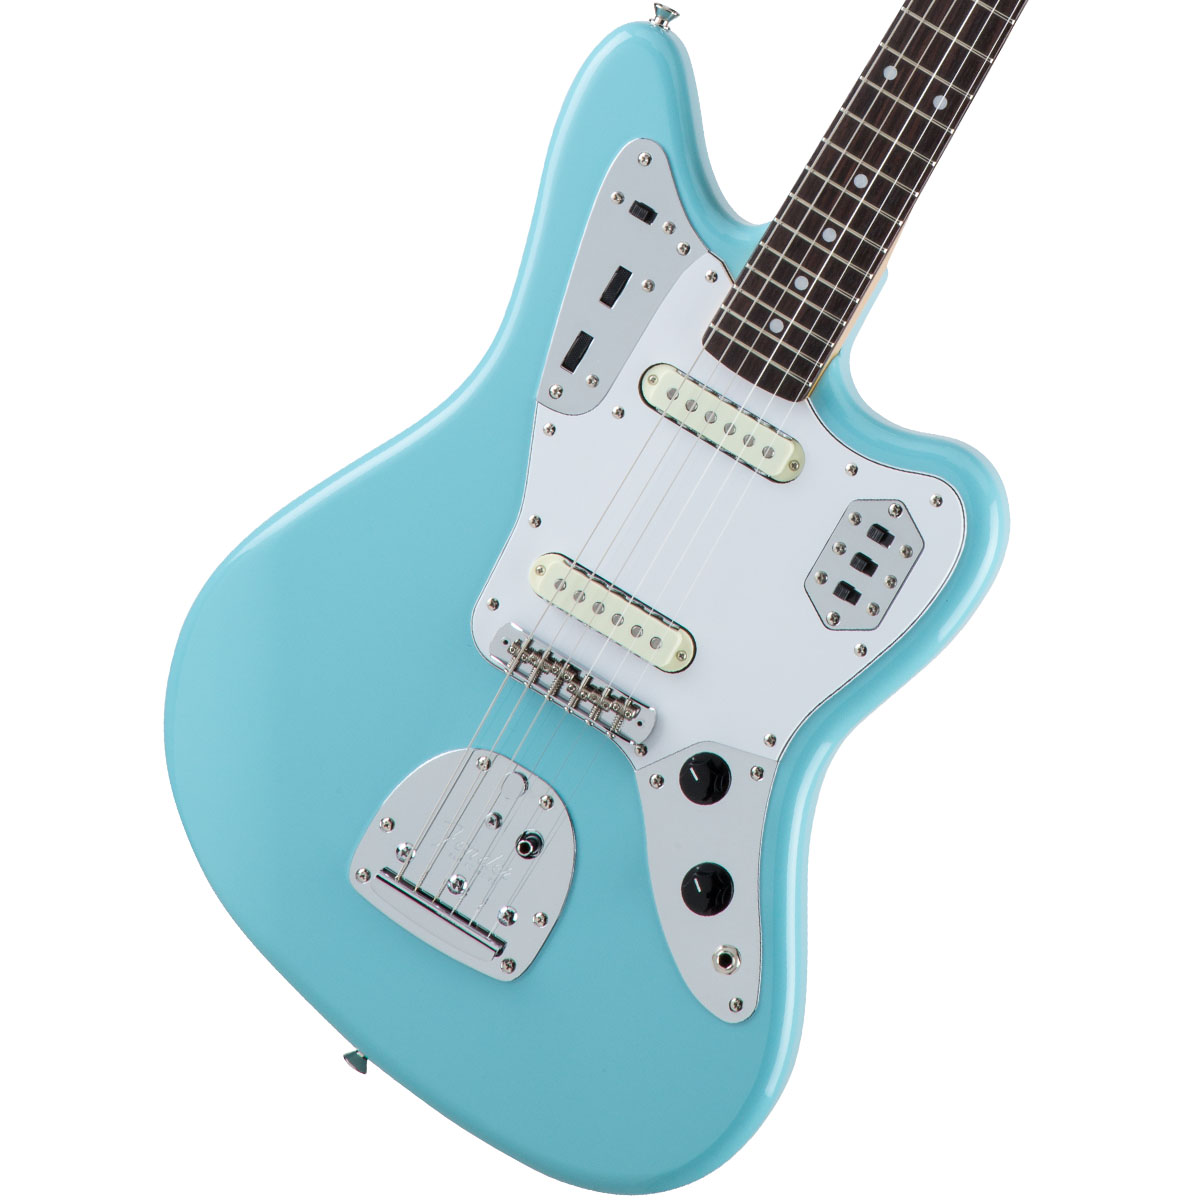 Fender / Made in Japan Traditional 60s Jaguar Rosewood Fingerboard Daphne Blue 【お取り寄せ商品】《カスタムショップのお手入れ用品を進呈/+671038200》